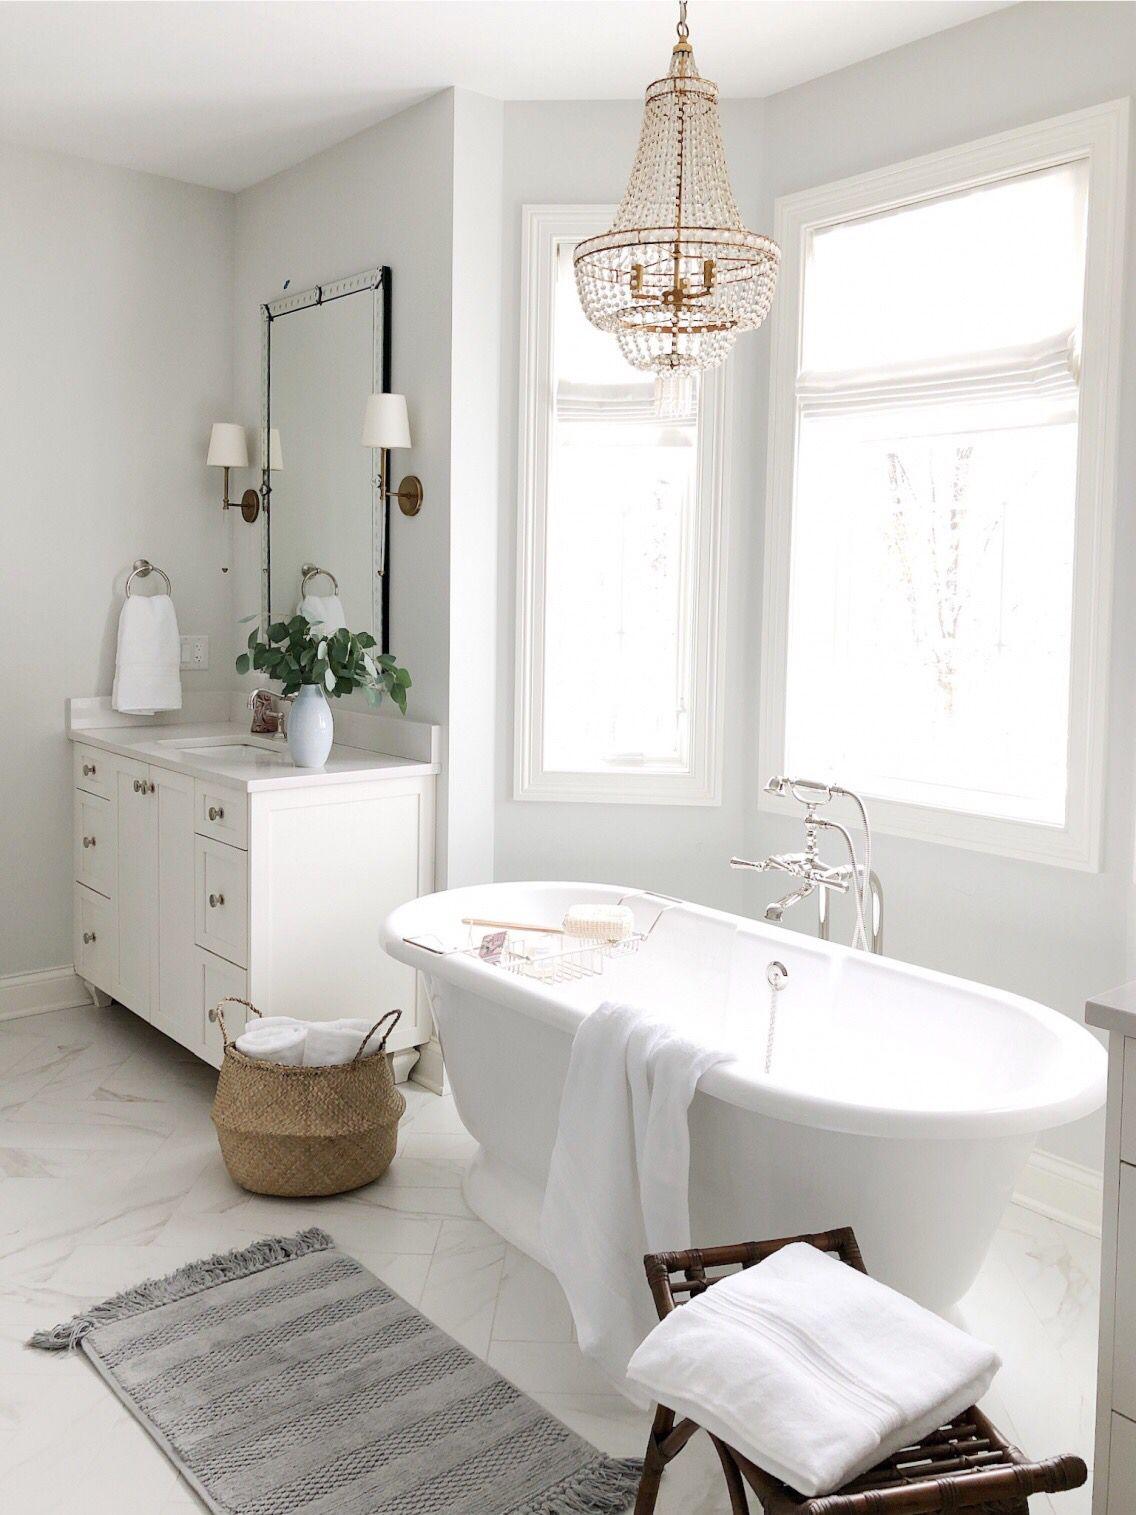 Bathroom Refresh With Pottery Barn Life On Cedar Lane Bathroom Remodel Master Bathroom Interior Bathrooms Remodel